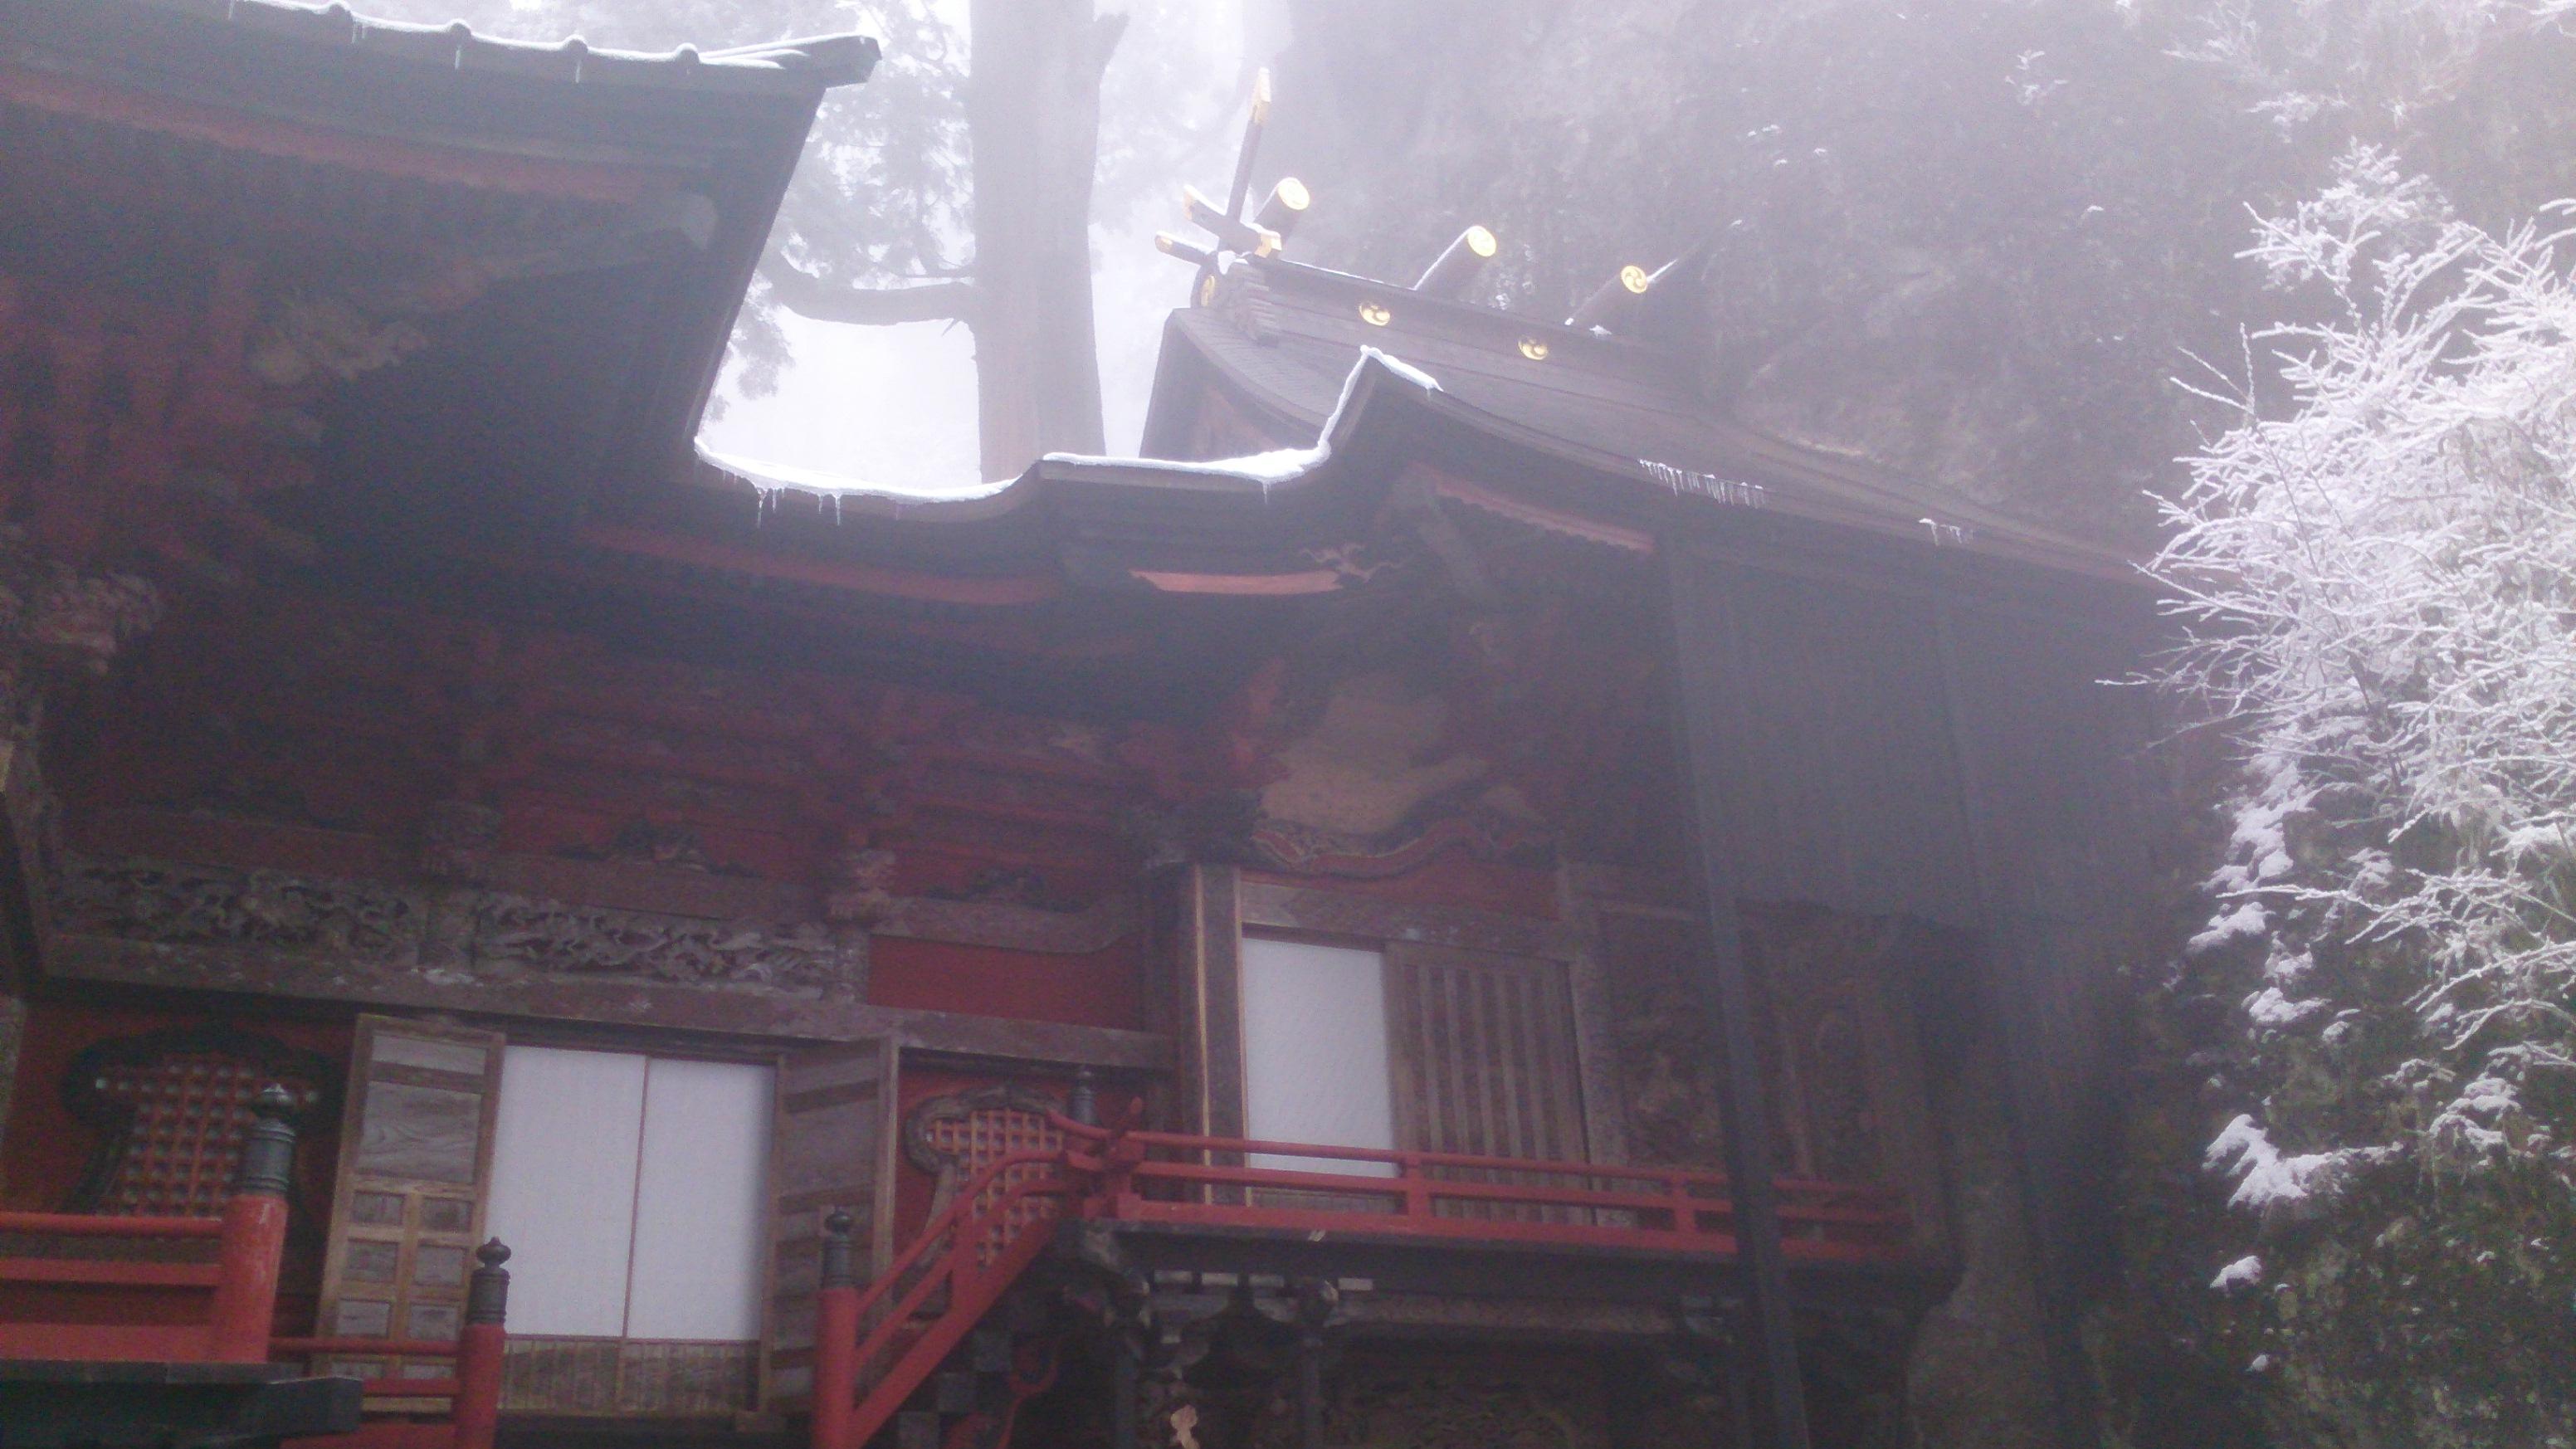 http://www.washin-optical.co.jp/blog/ladies/DSC_0696.jpg